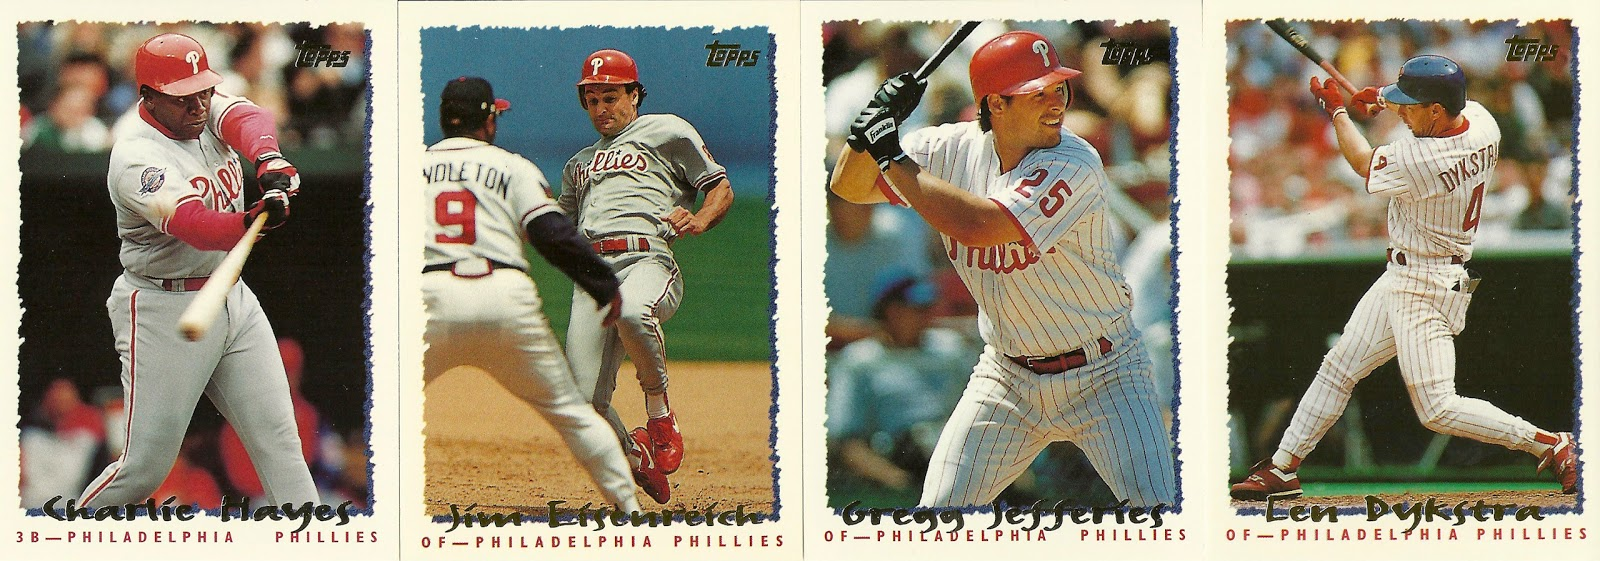 1995 Topps 103 Mariano Duncan Baseball Cards Philadelphia Phillies